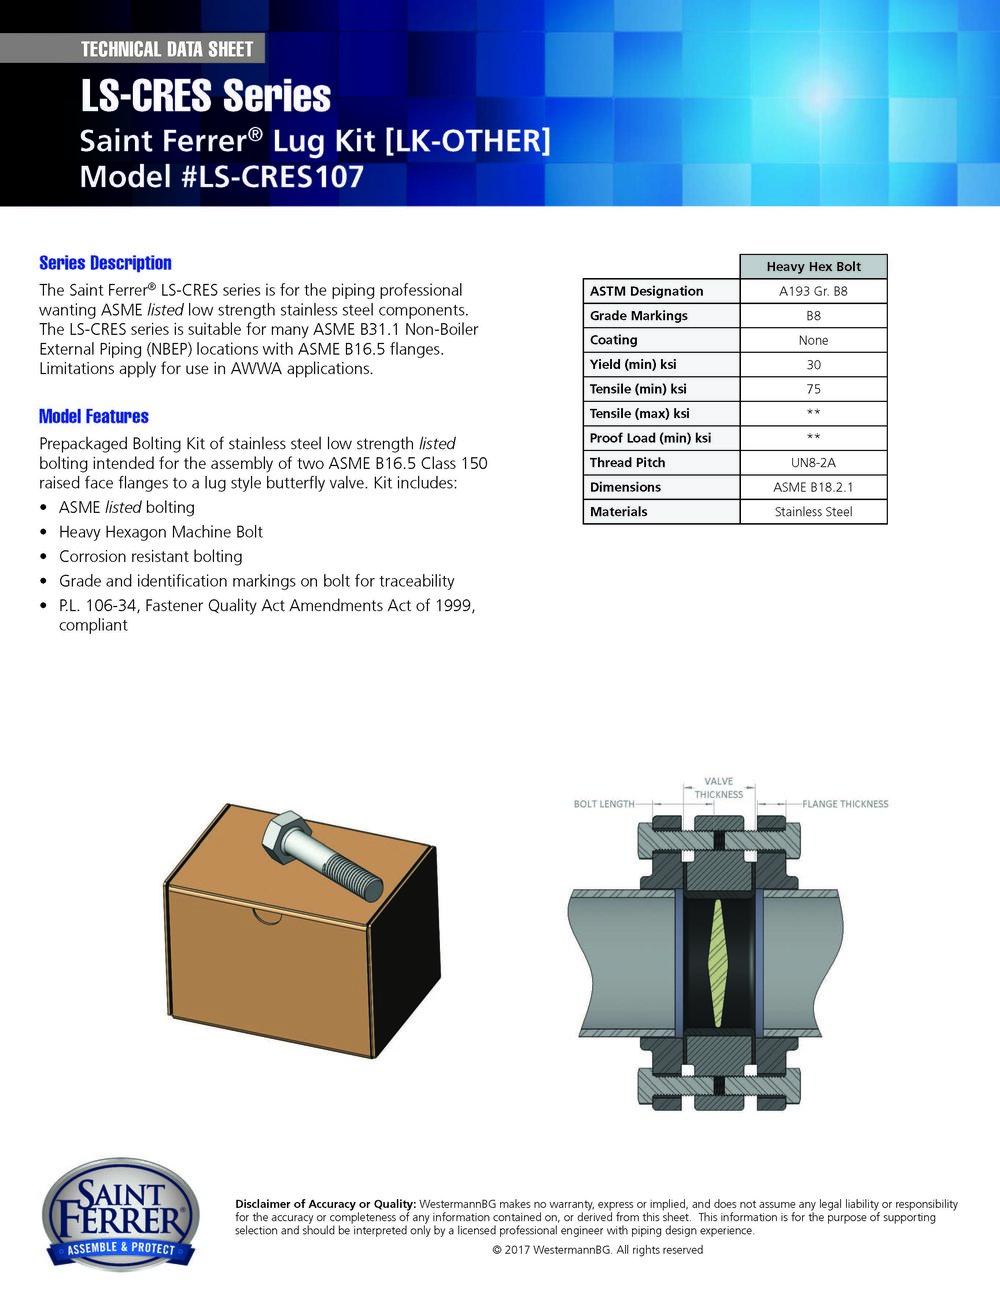 SF_Data_Sheet_LS-CRES_Series_LS-CRES107.jpg